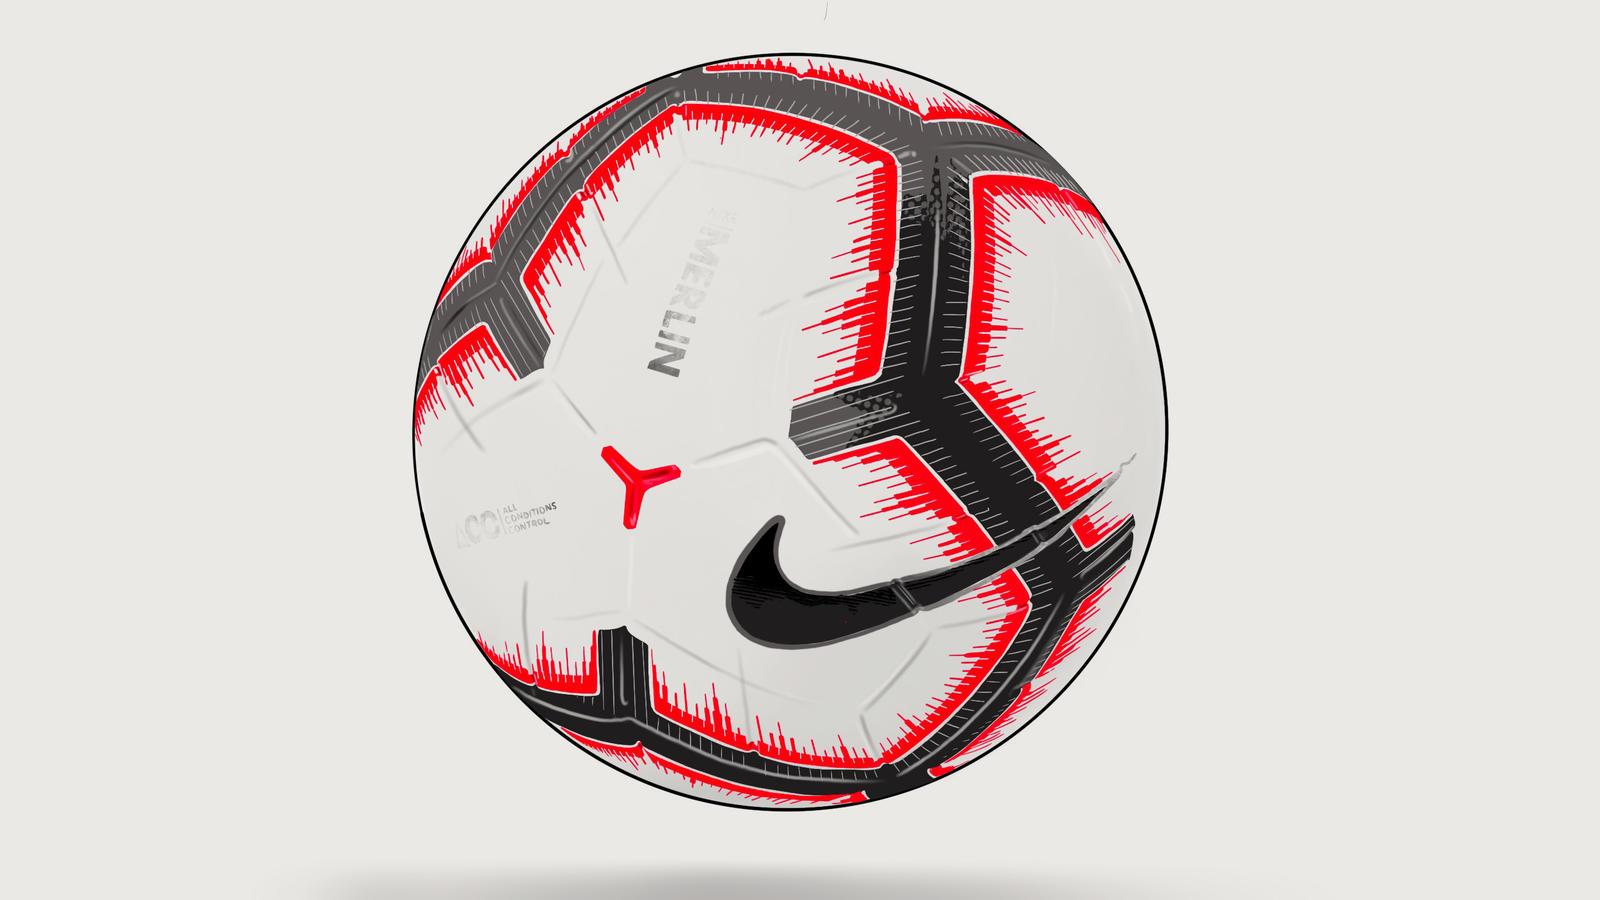 Nike Flight Ball 5